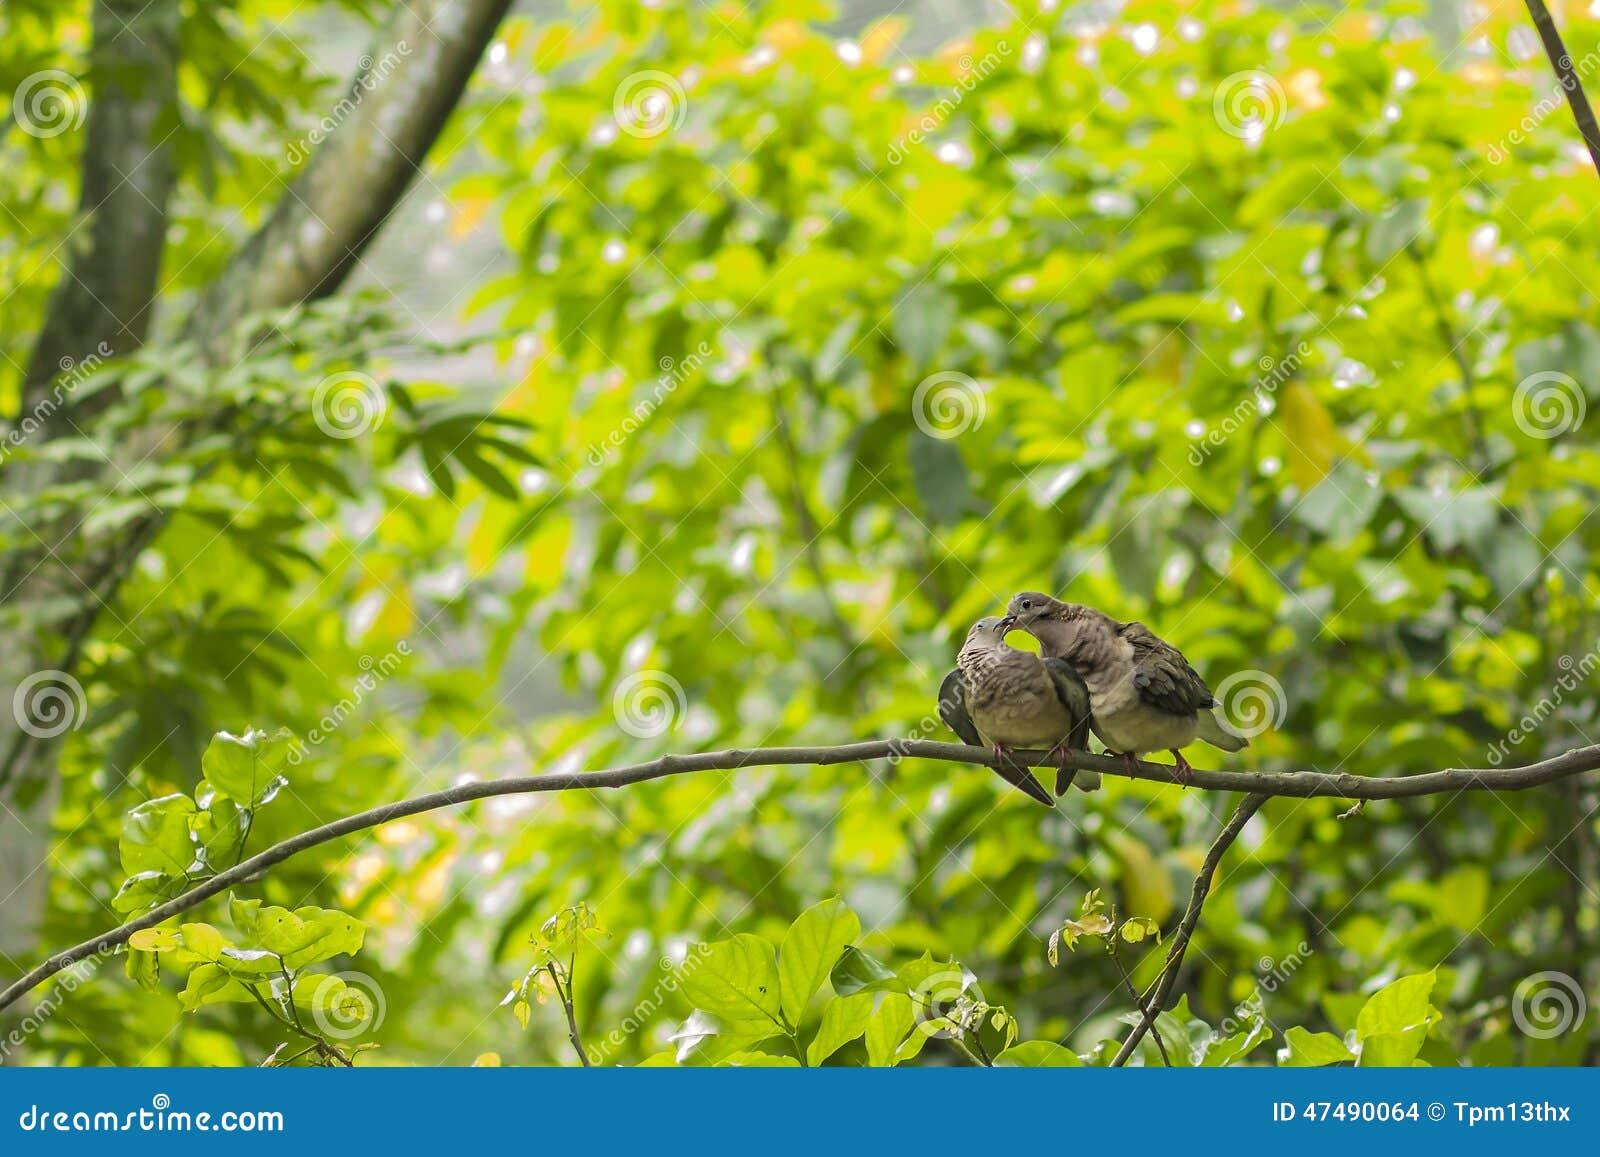 Couple of Turtledoves